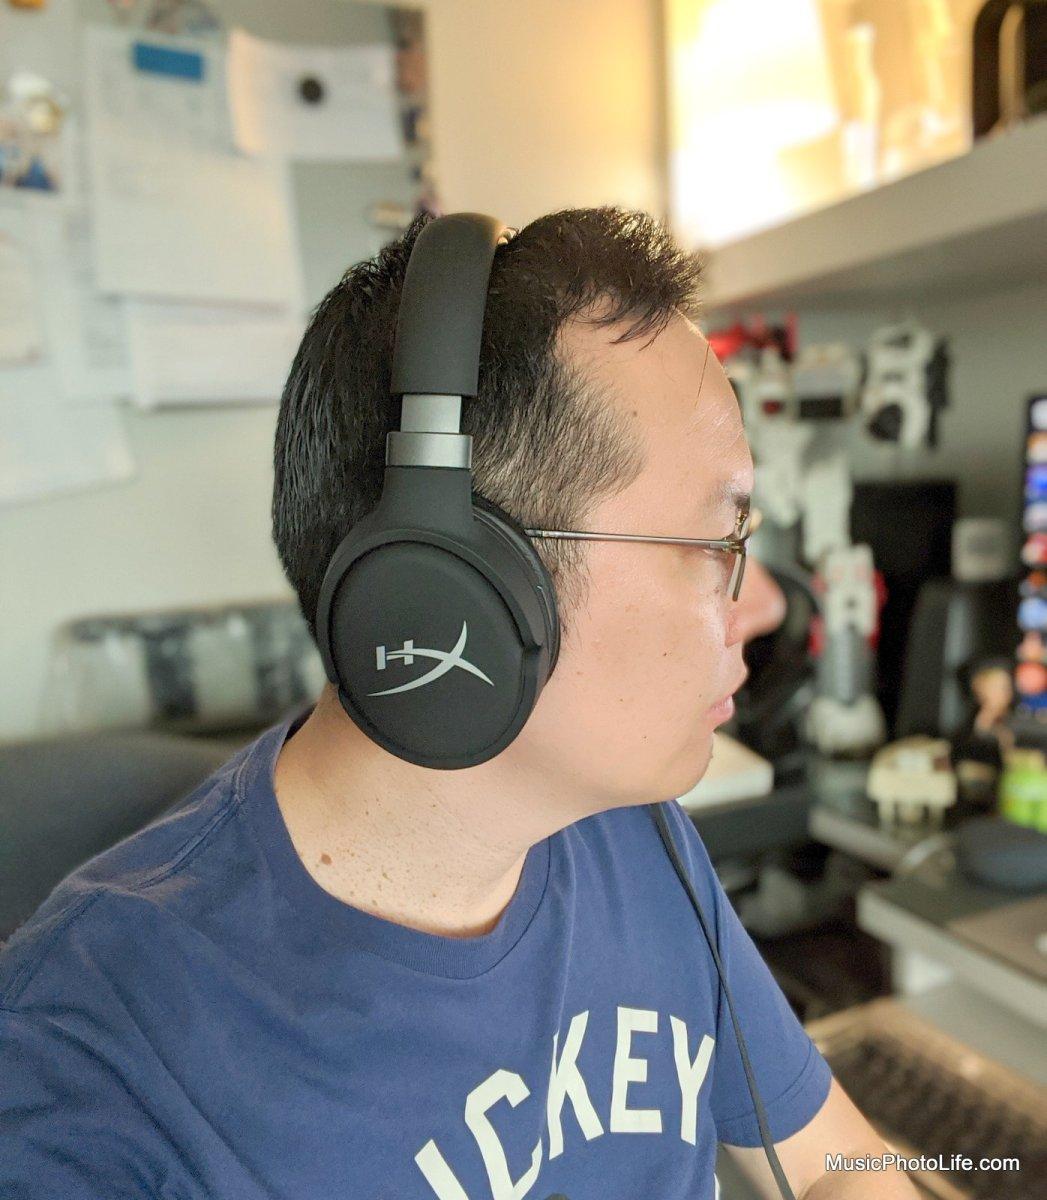 Chester wearing the HyperX Cloud Orbit S 3D surround gaming headphones